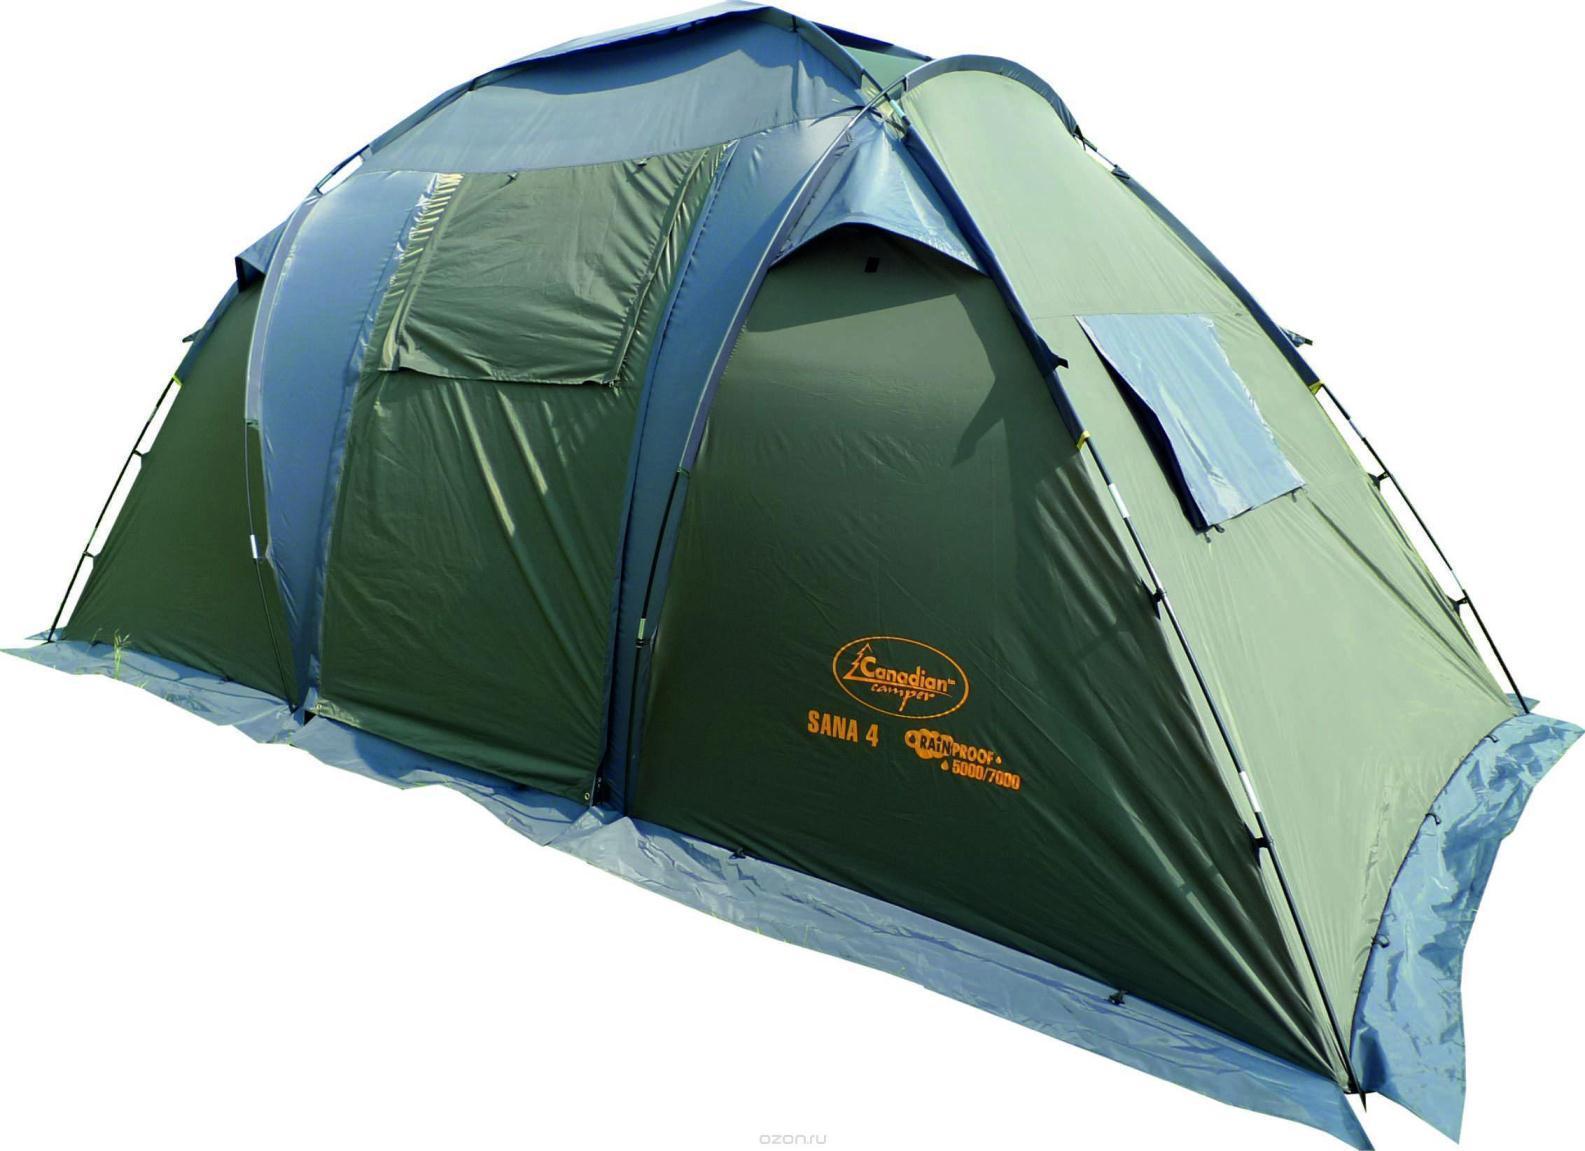 Палатка CANADIAN CAMPER SANA 4 (цвет forest) sana beauty cafe